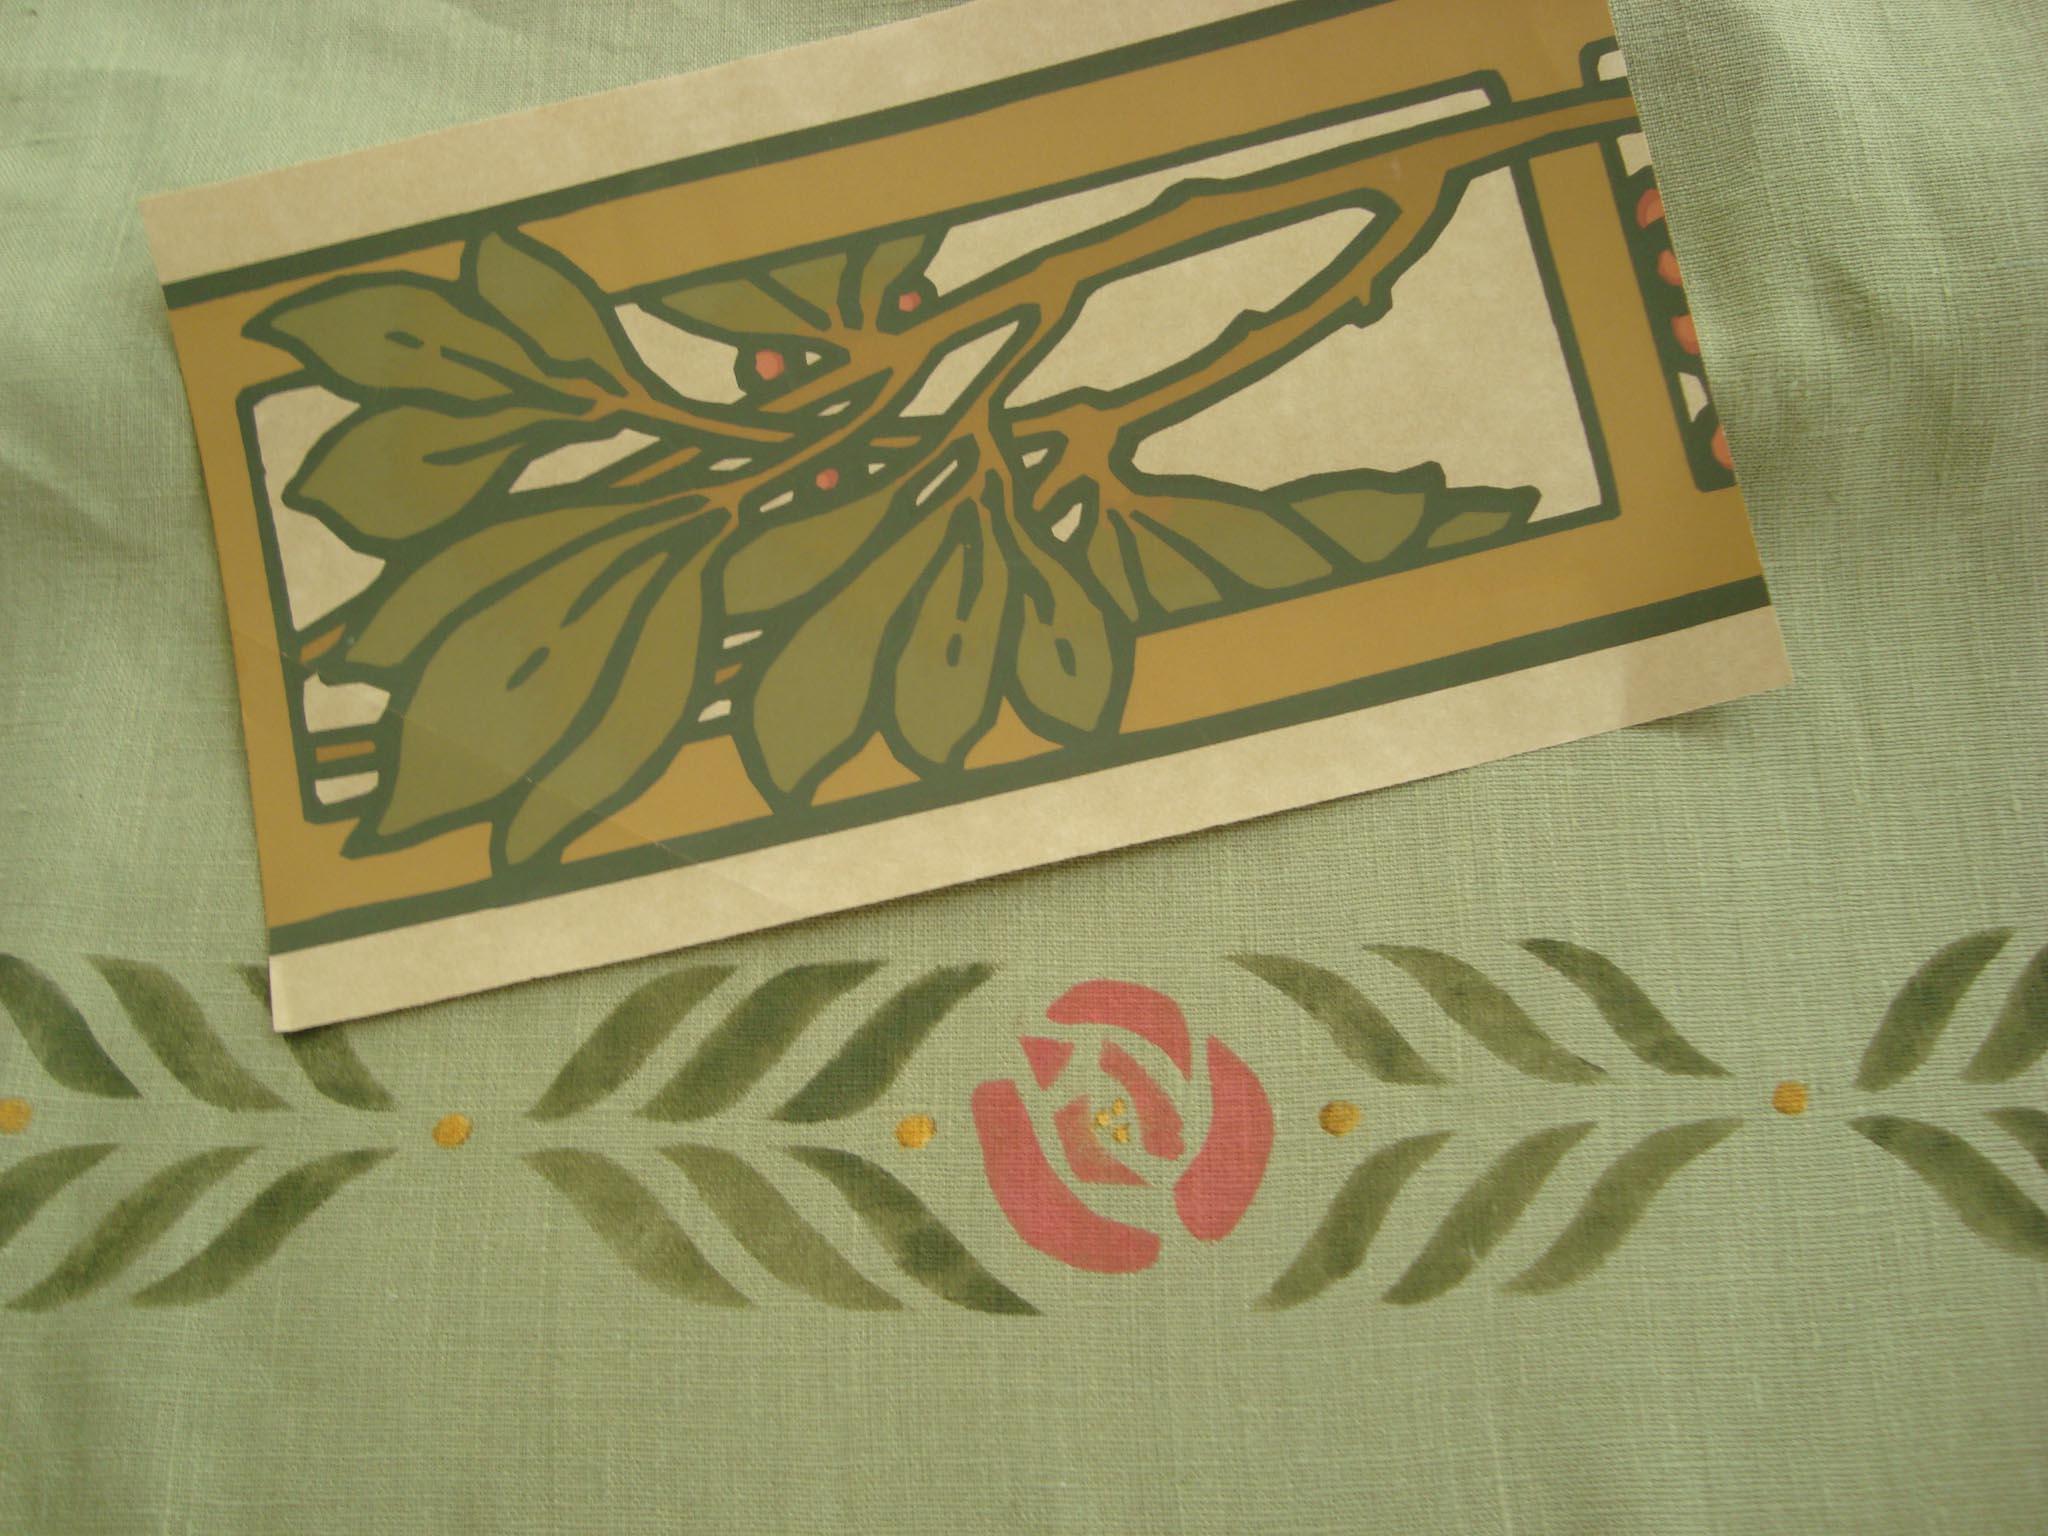 Small Rose stencil with Bradbury Thornberry